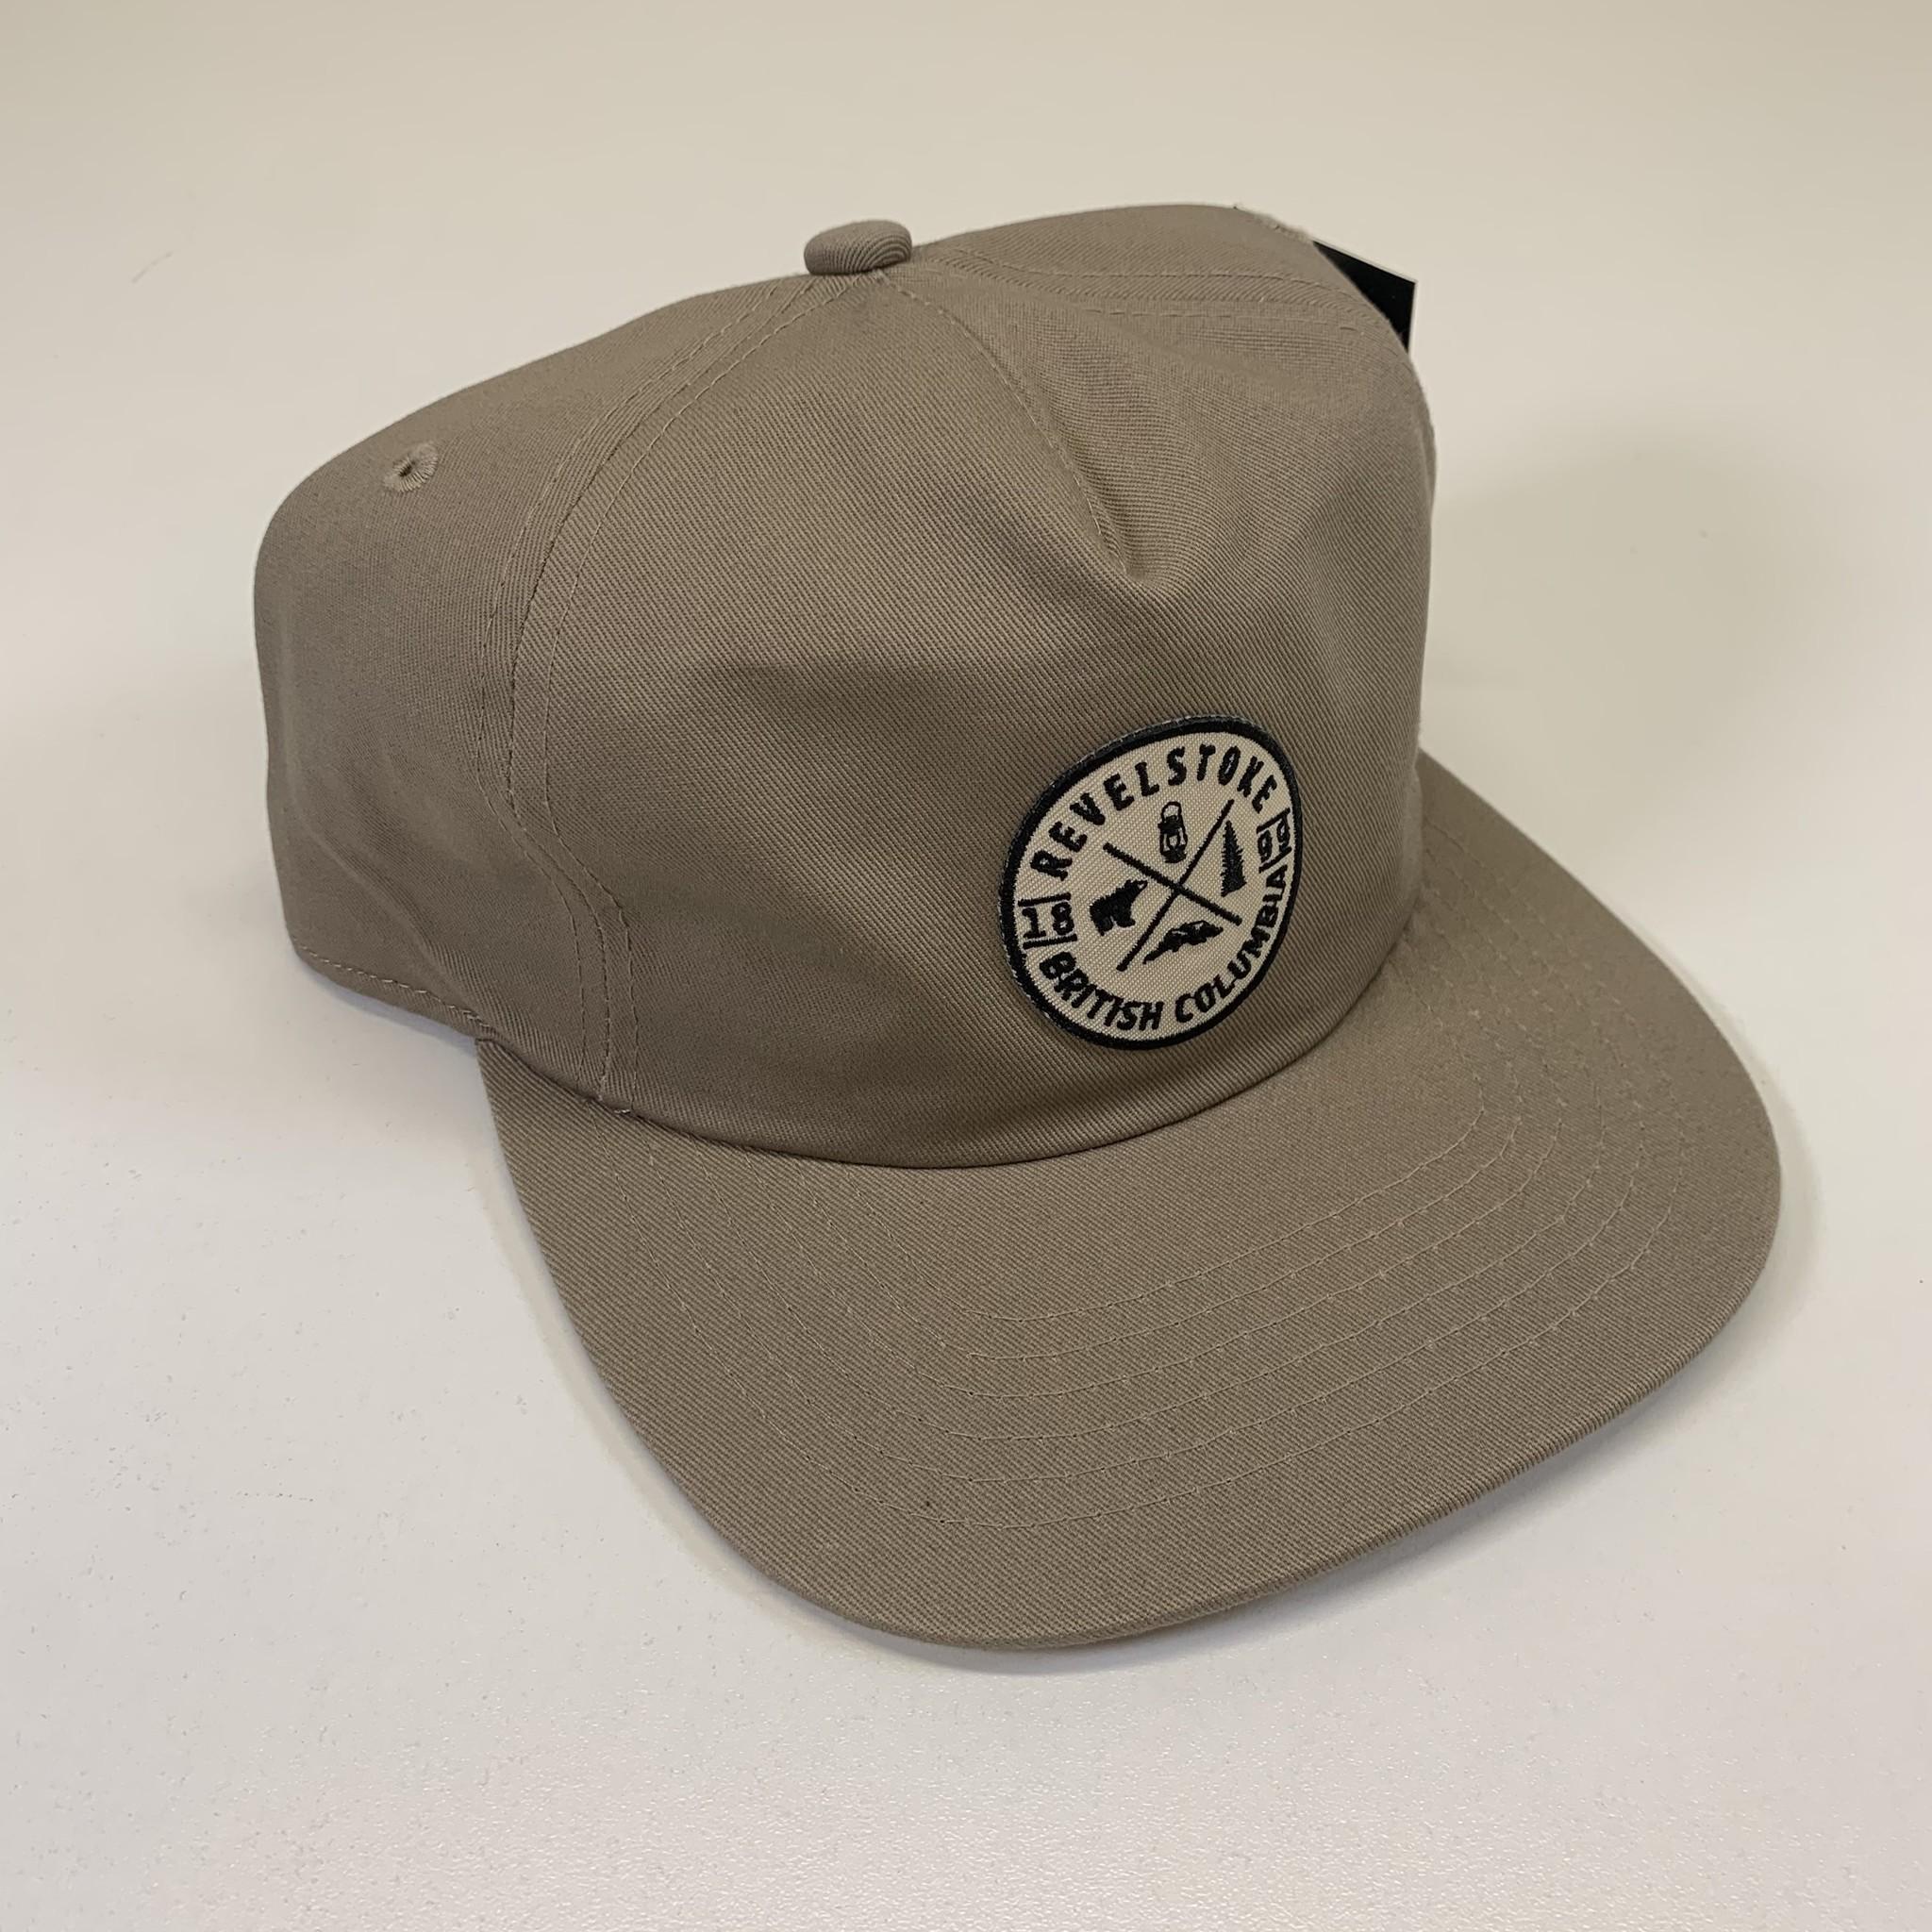 Trading Co. Revelstoke - 1899 Patch Cap (Khaki)